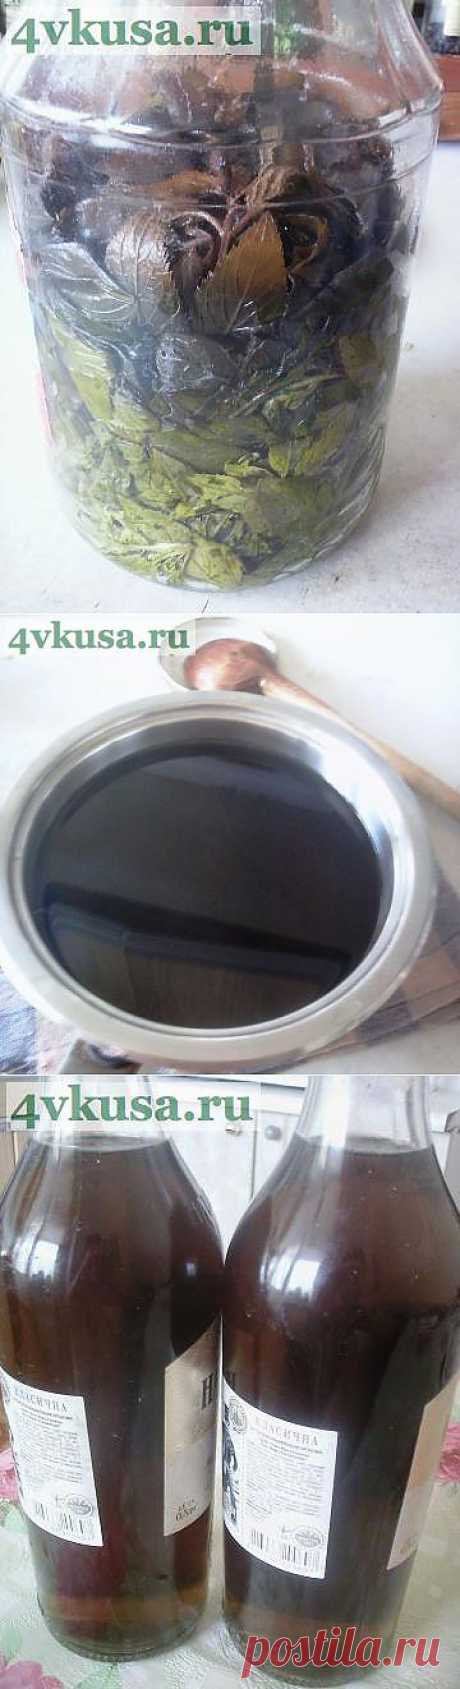 МЯТНЫЙ СПОТЫКАЧ | 4vkusa.ru